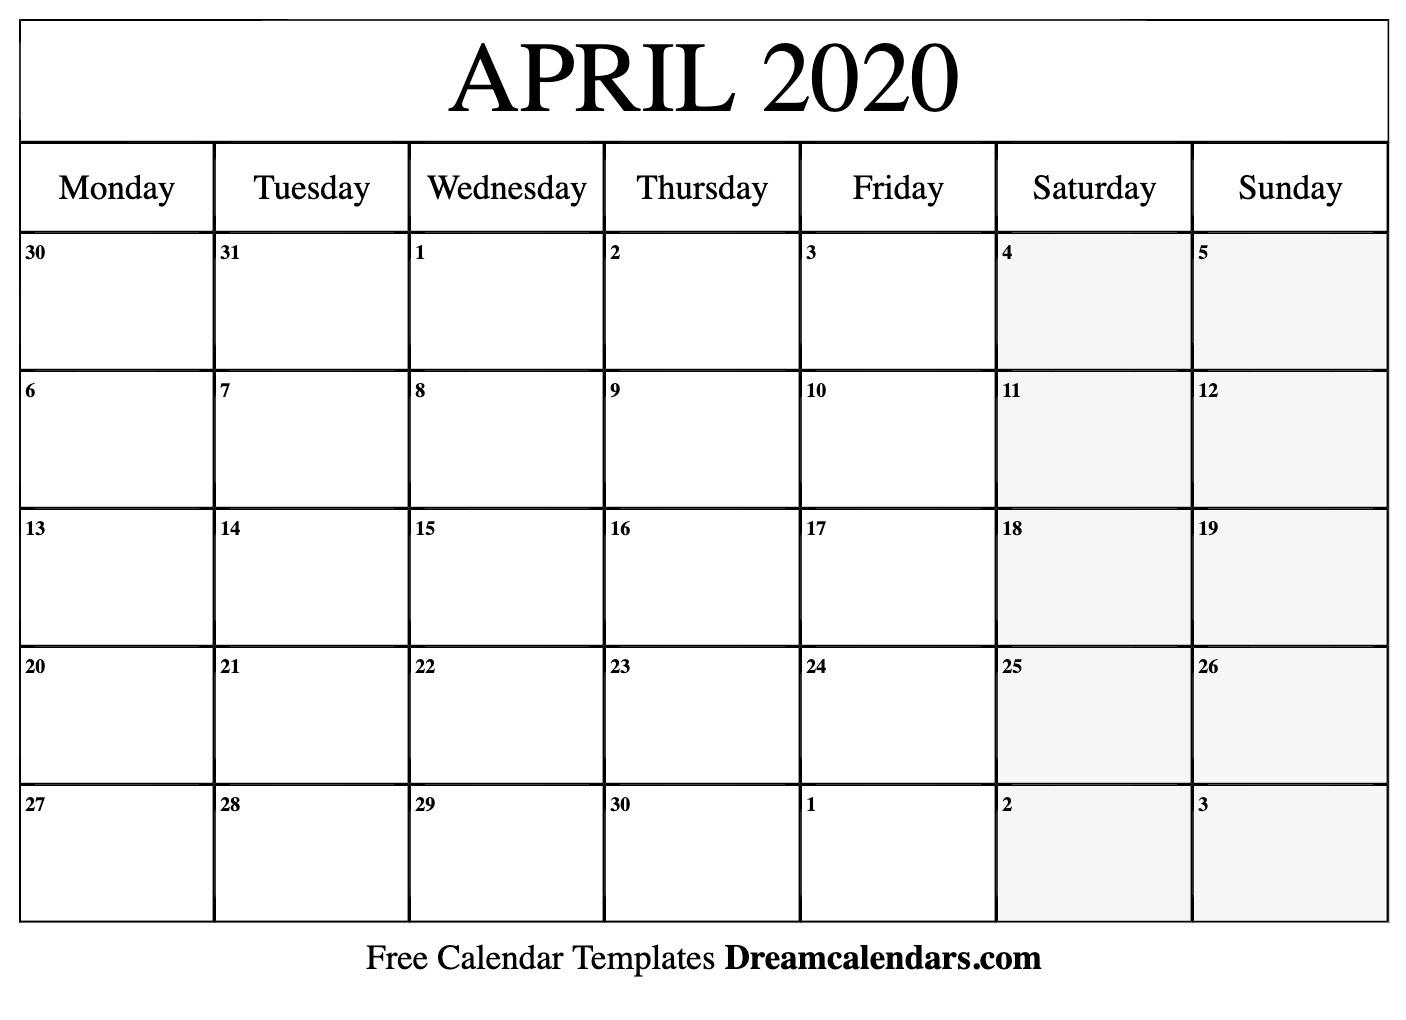 Printable April 2020 Calendar_Blank Calendar April 2020 Printable